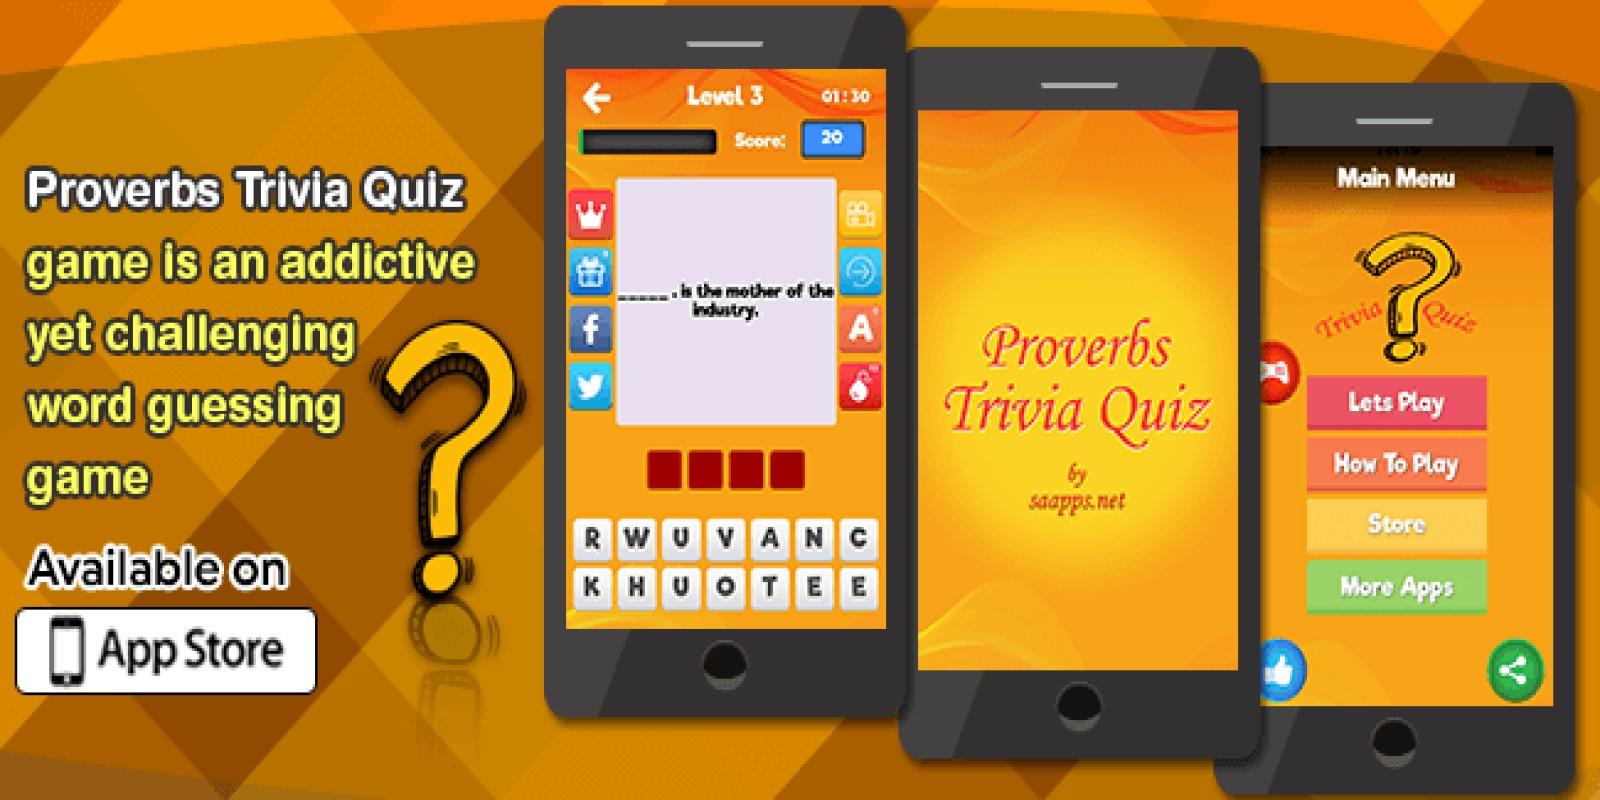 Proverbs Trivia Quiz - iOS Source Code